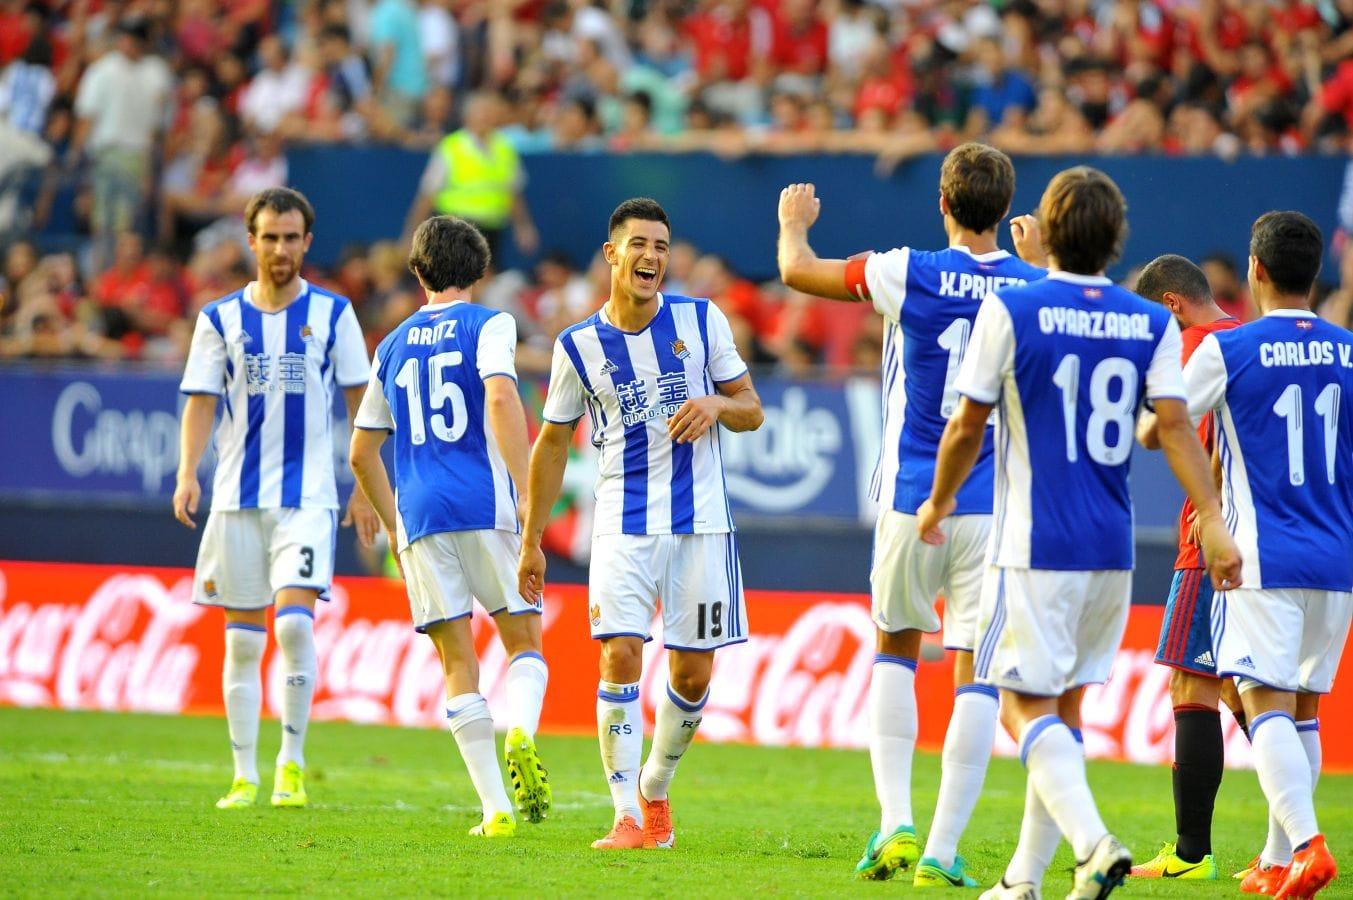 Real Football - 983592